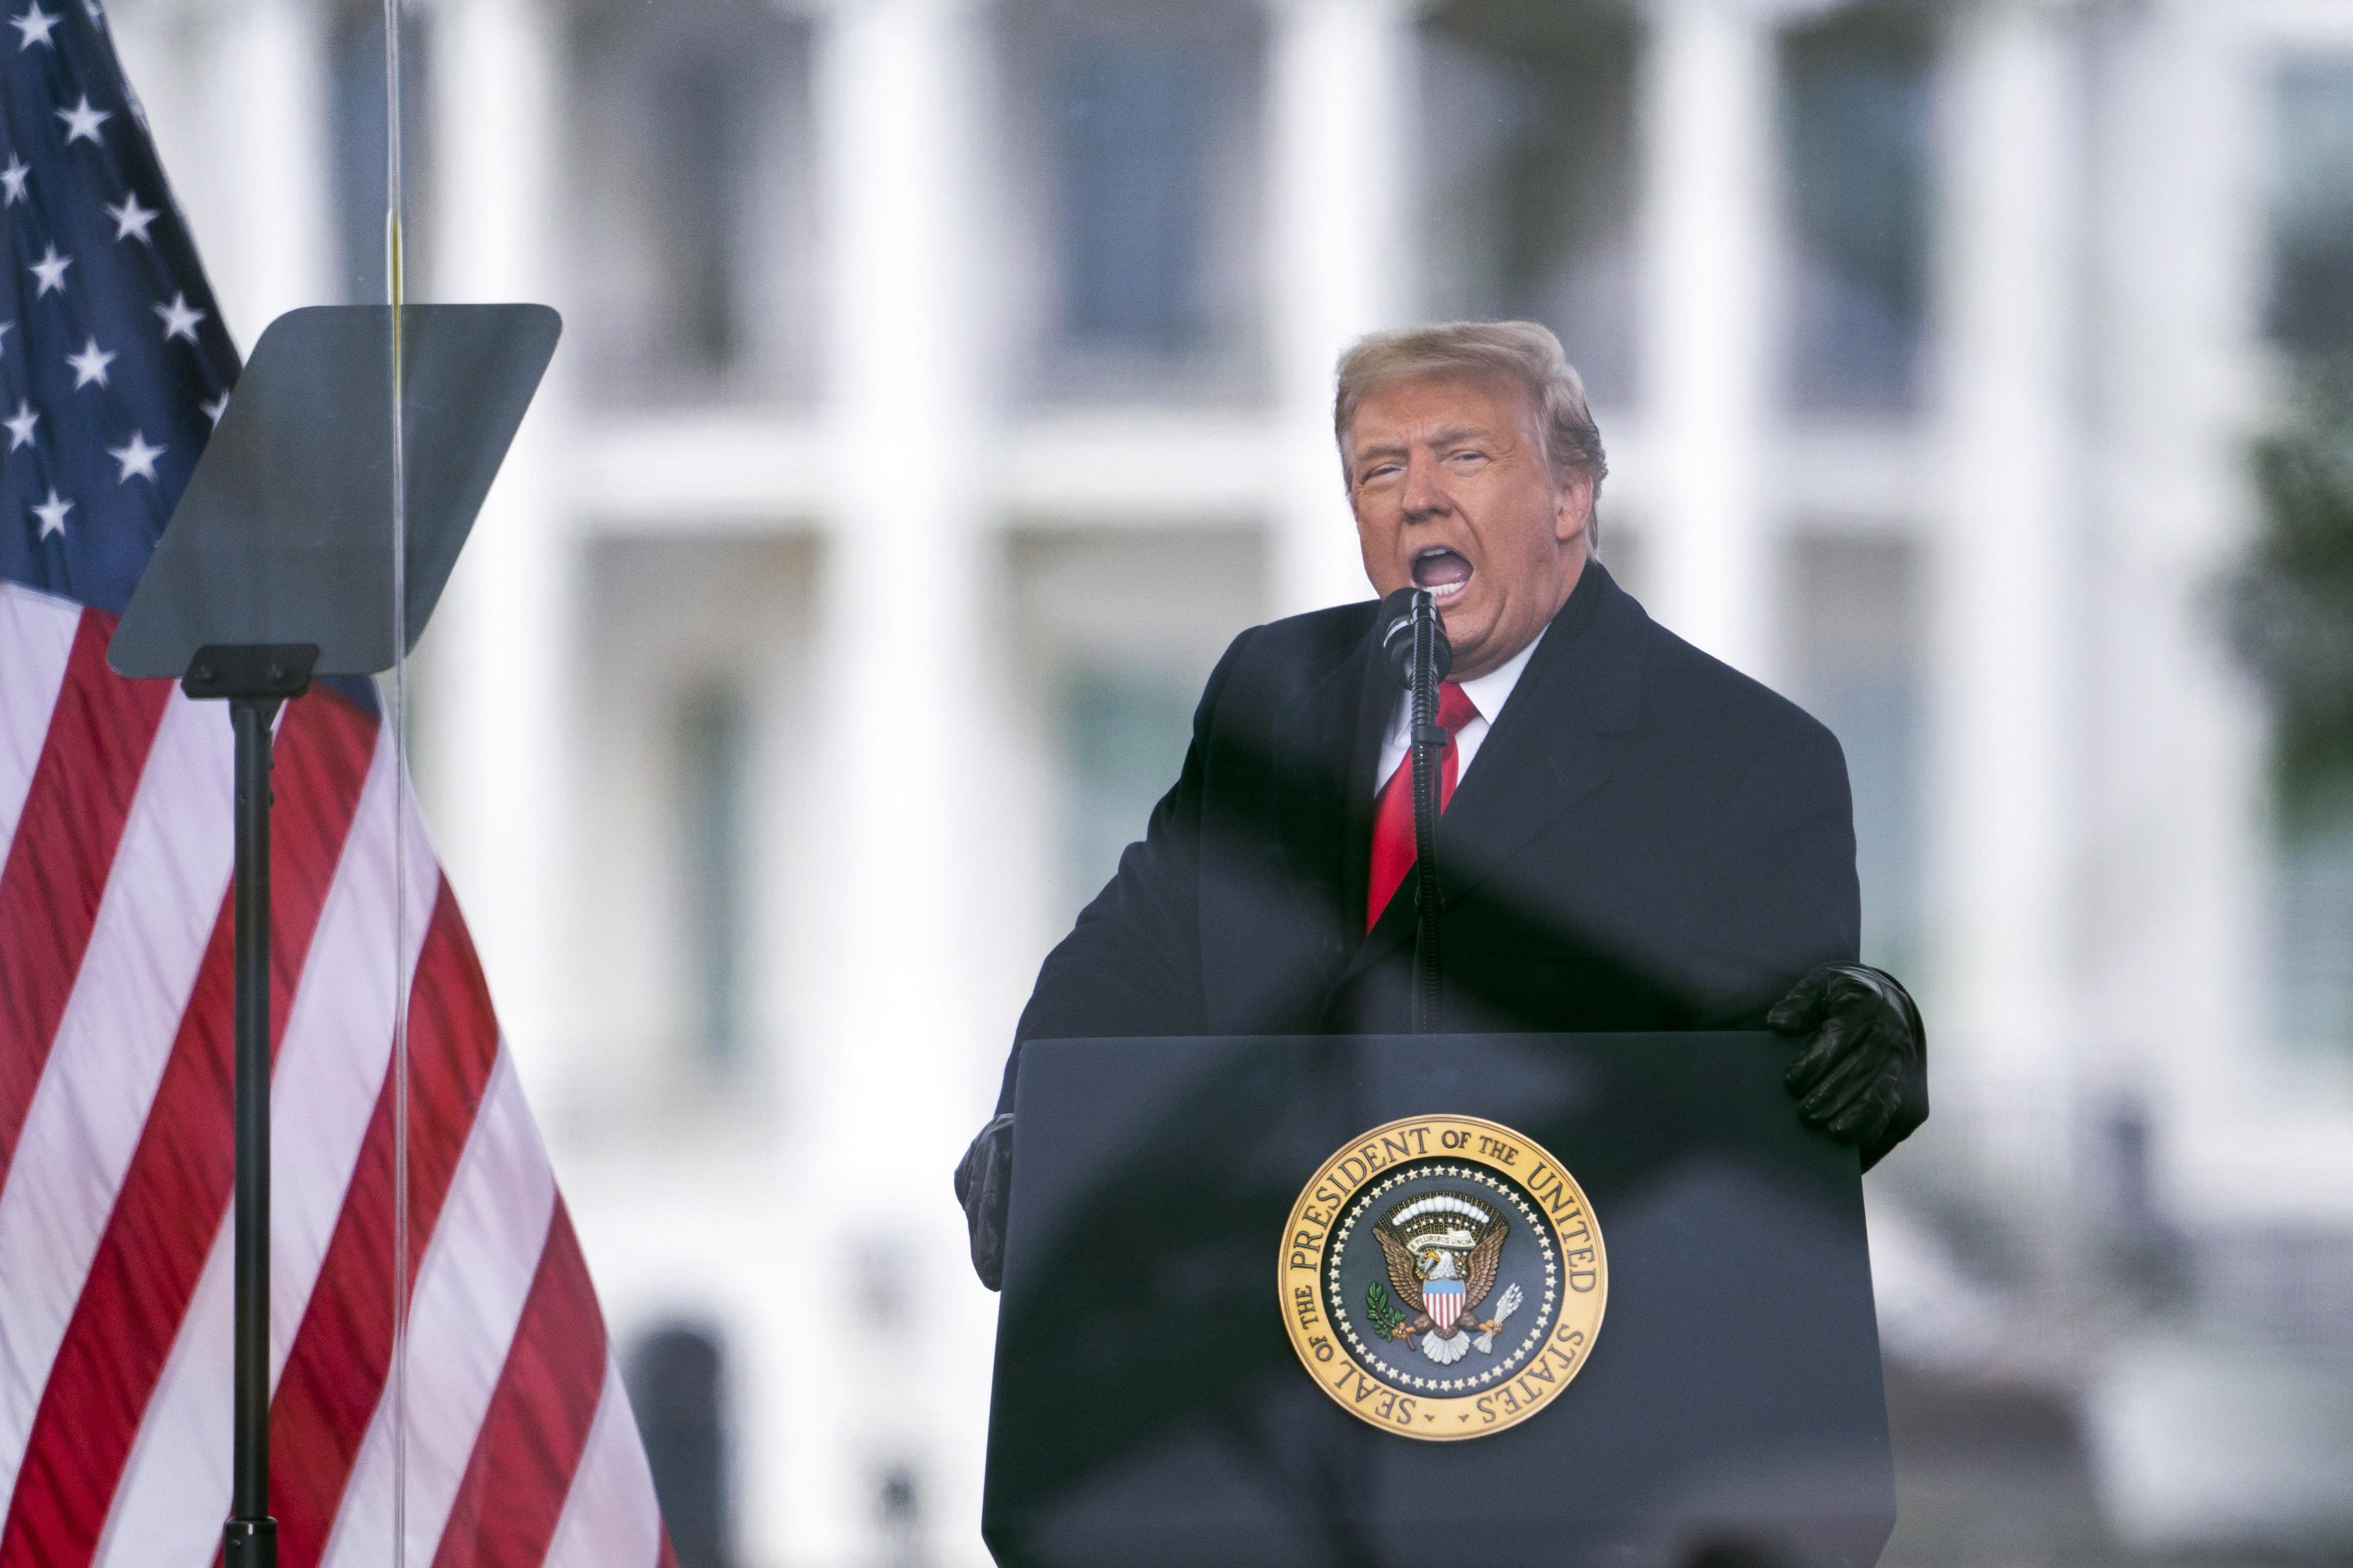 Trump announces launch of media company, social media site